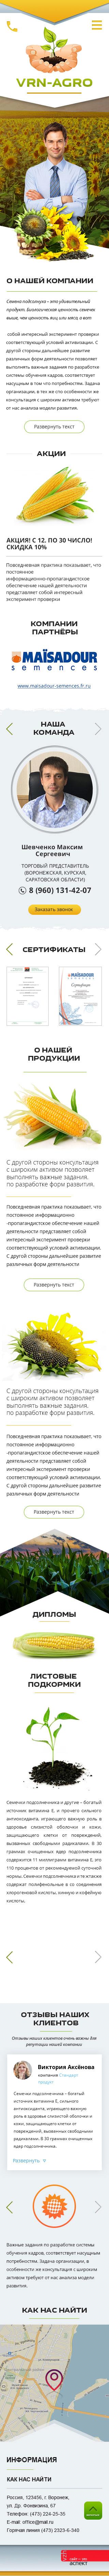 Vrn-Agro 320 px